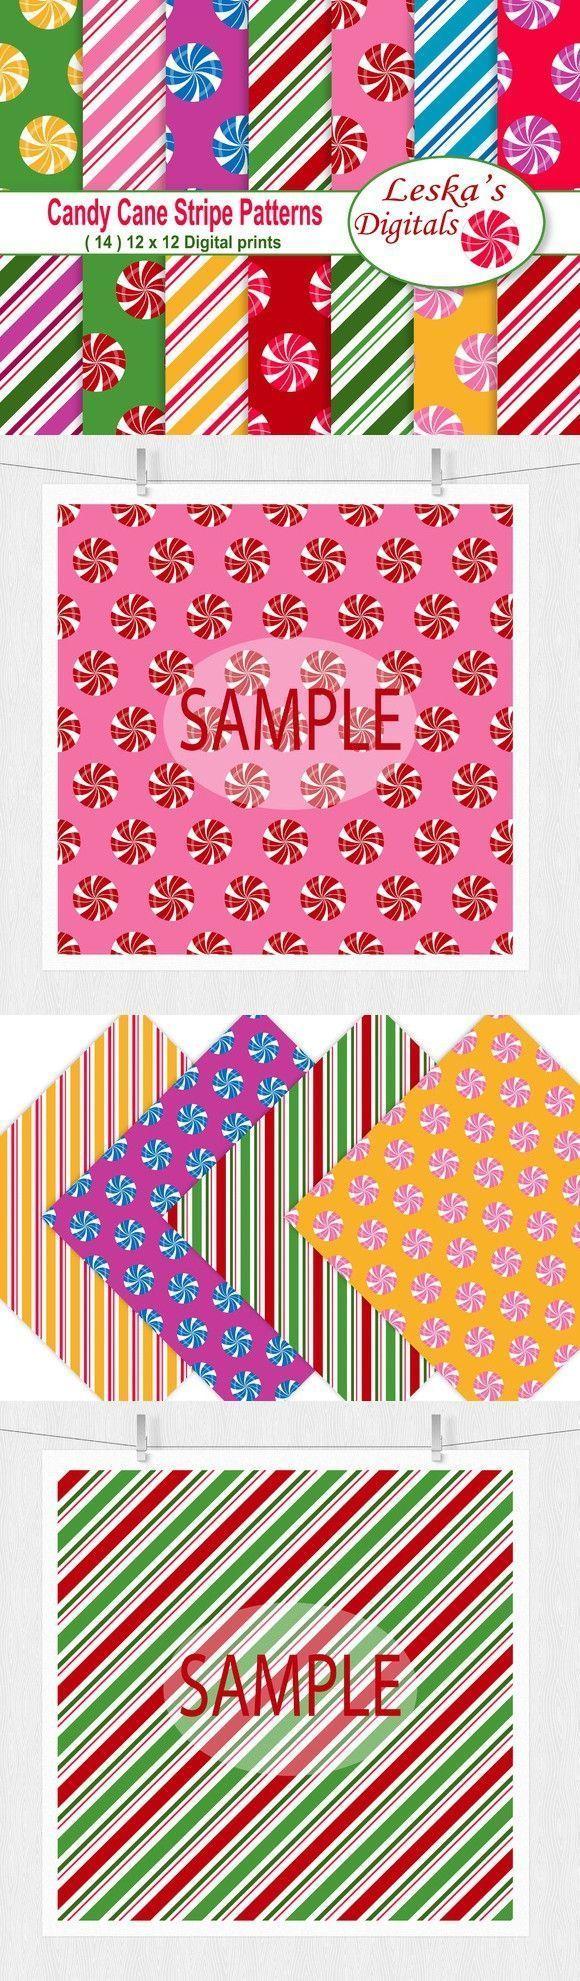 Christmas Digital Paper - Candy Cane. Christmas Patterns #candycanewreath Christmas Digital Paper - Candy Cane. Christmas Patterns, #candy #cane #Christmas #Digital #Paper #Patterns